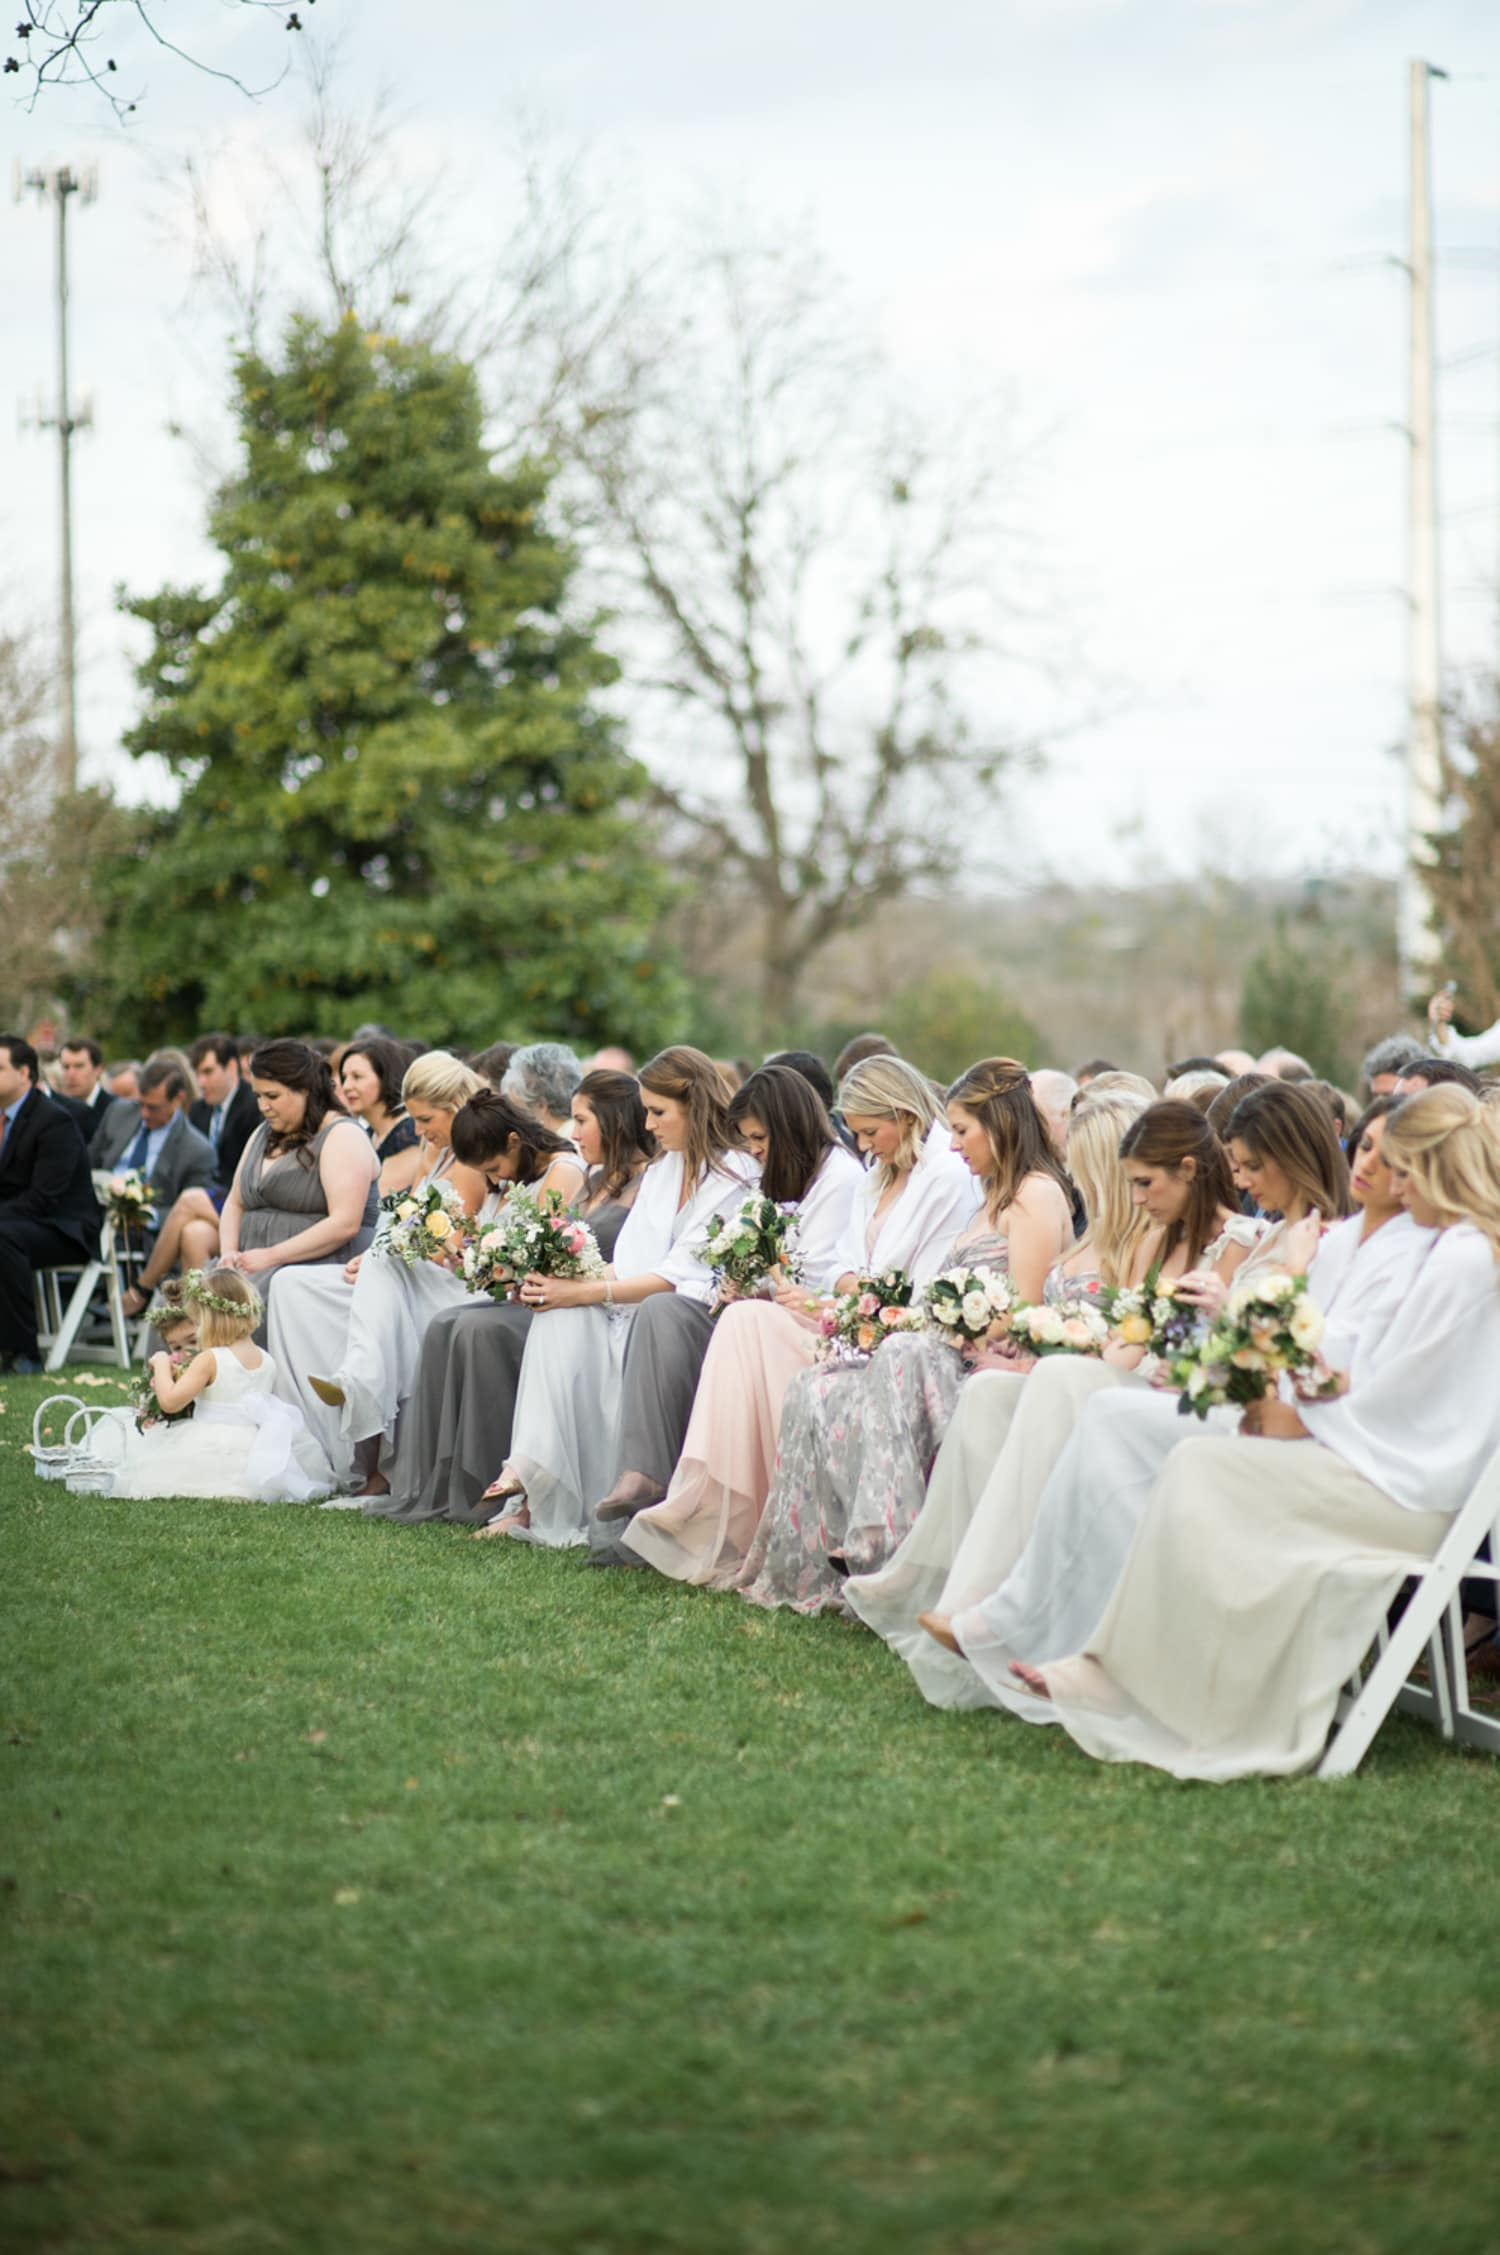 barr-mansion-wedding-27.jpg